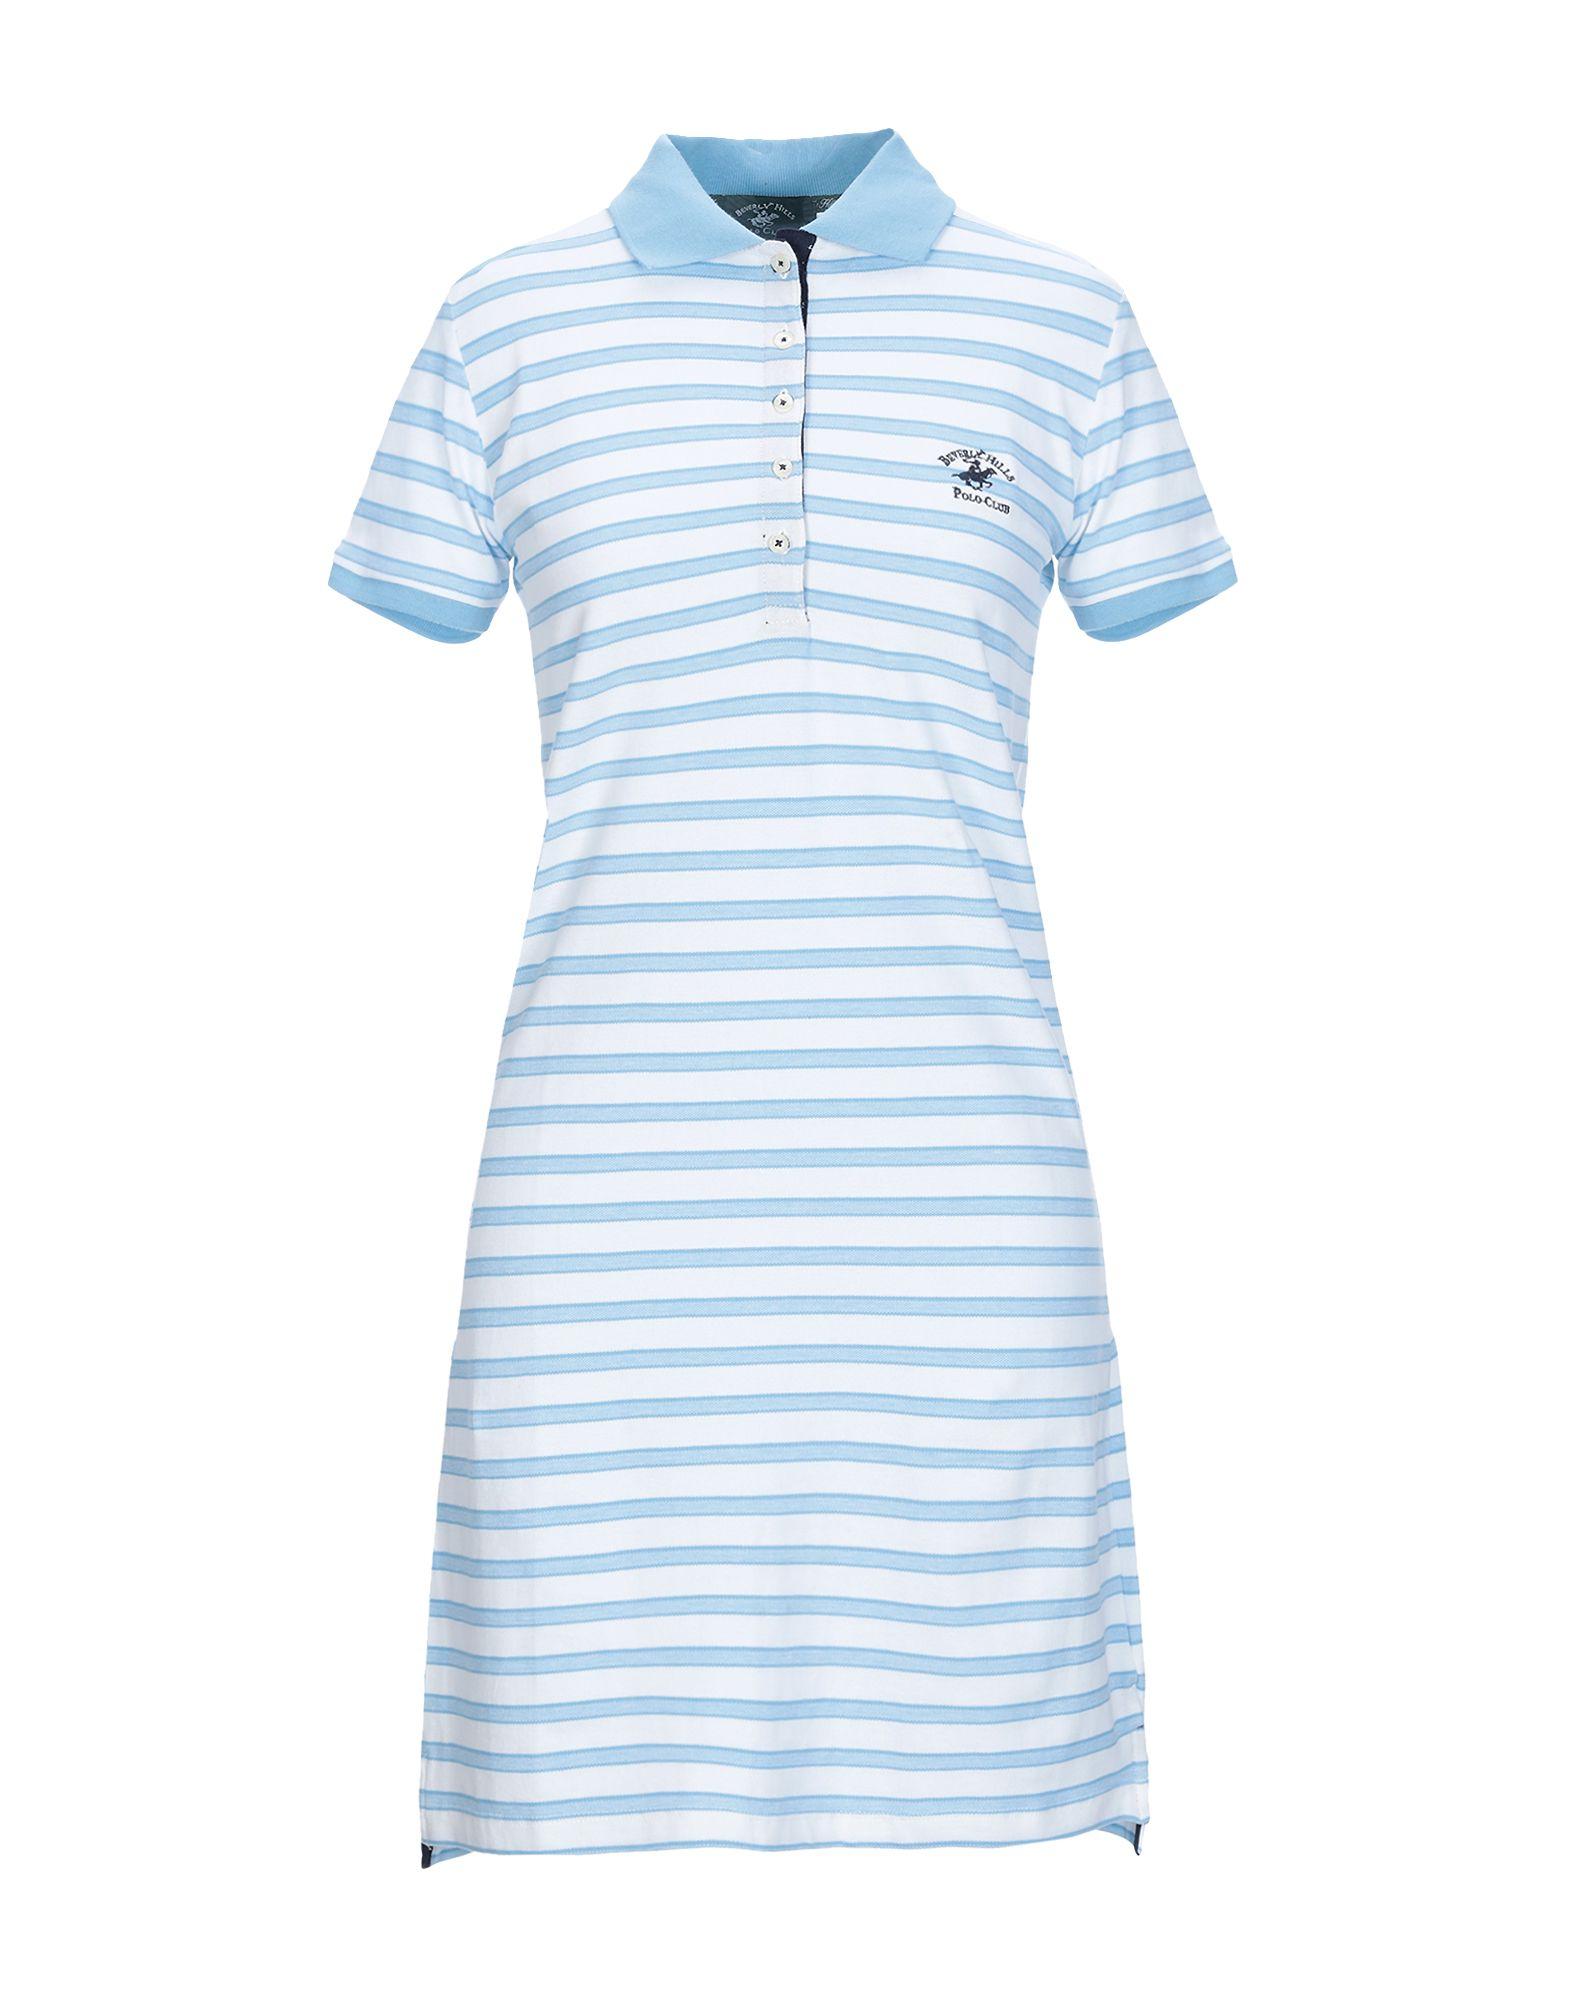 BEVERLY HILLS POLO CLUB Damen Kurzes Kleid Farbe Himmelblau Größe 5